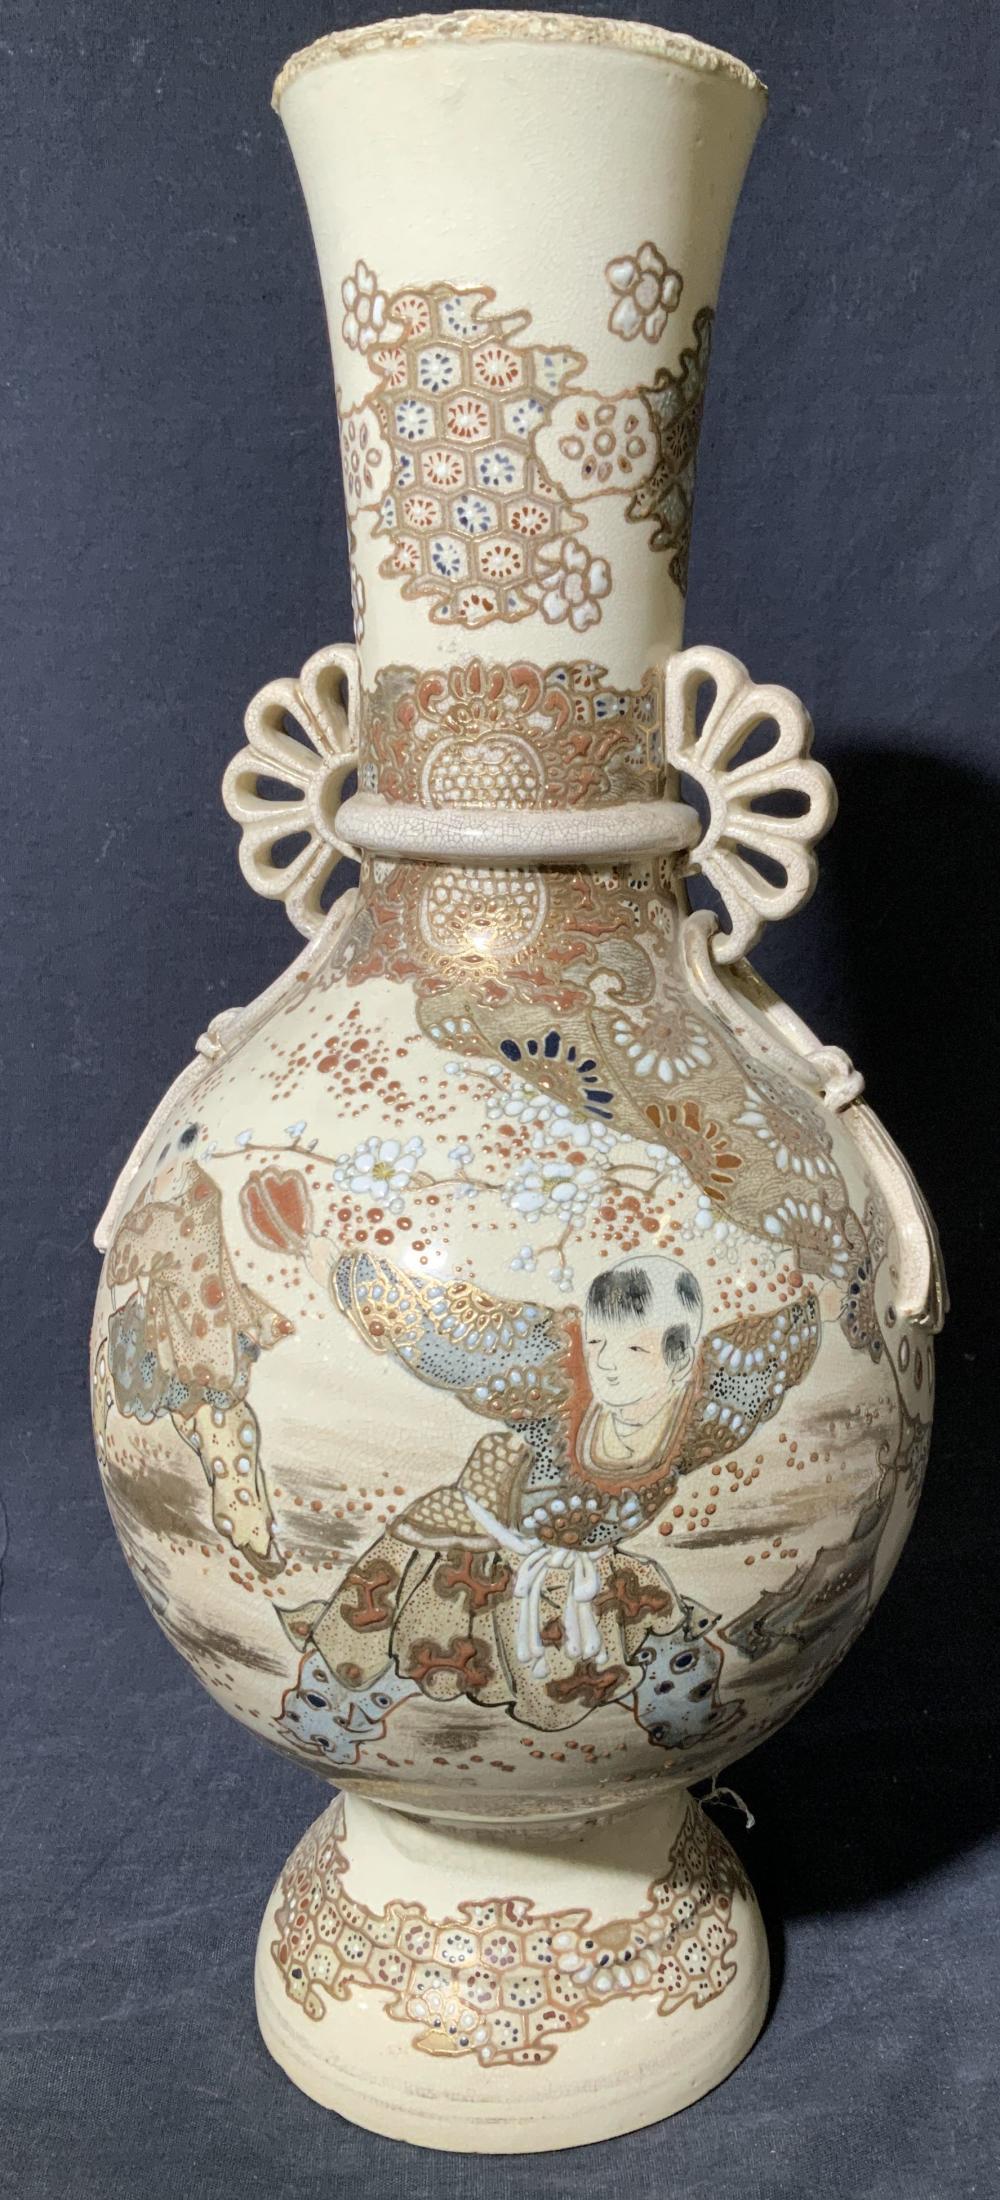 Japanese Satsuma Vintage Porcelain Vase